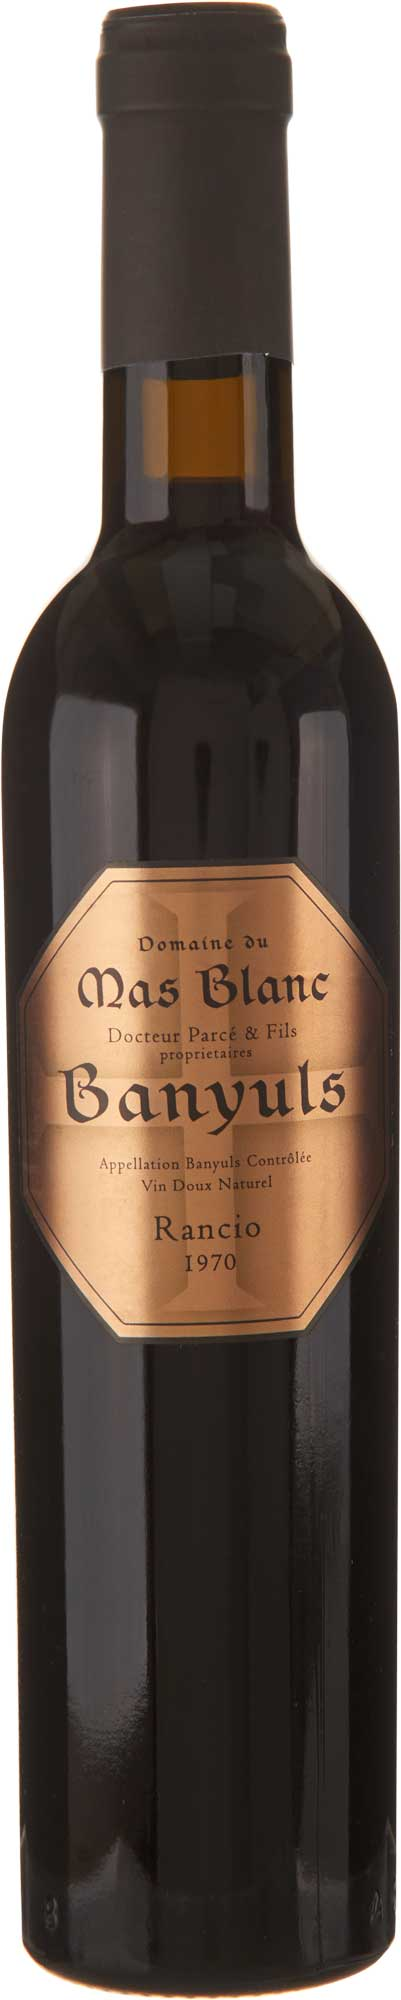 Domaine du Mas Blanc Banyuls Rancio 1970